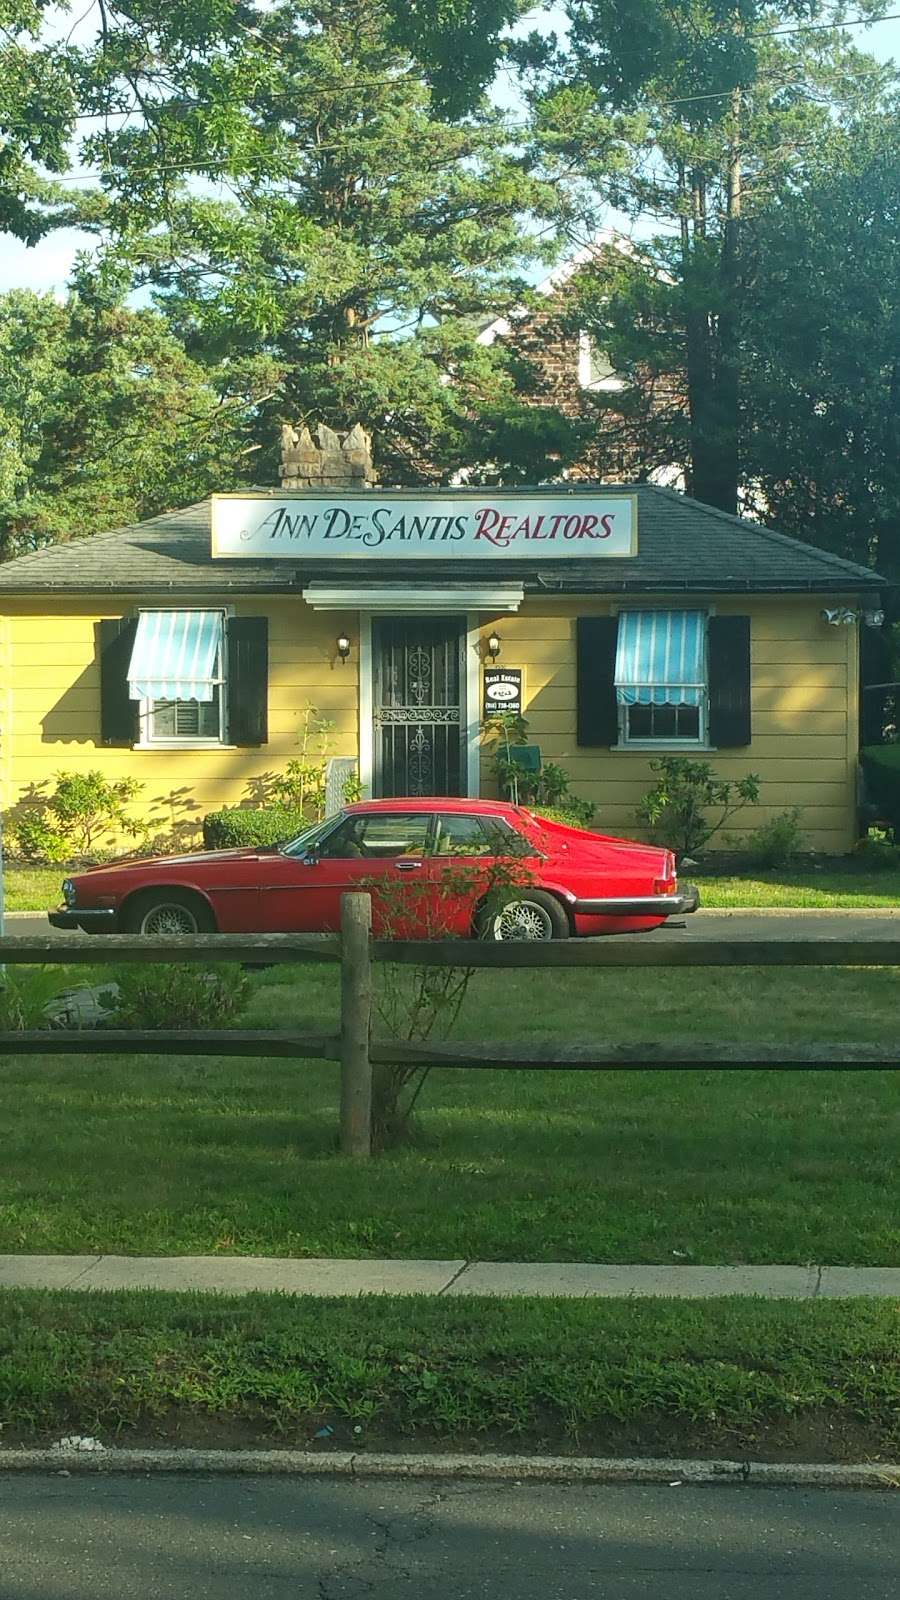 Pelham Real Estate: Kravitz Realtors (Ann De Santis Real Estate) - real estate agency  | Photo 1 of 2 | Address: 4550 Boston Post Rd, Pelham, NY 10803, USA | Phone: (914) 738-7777